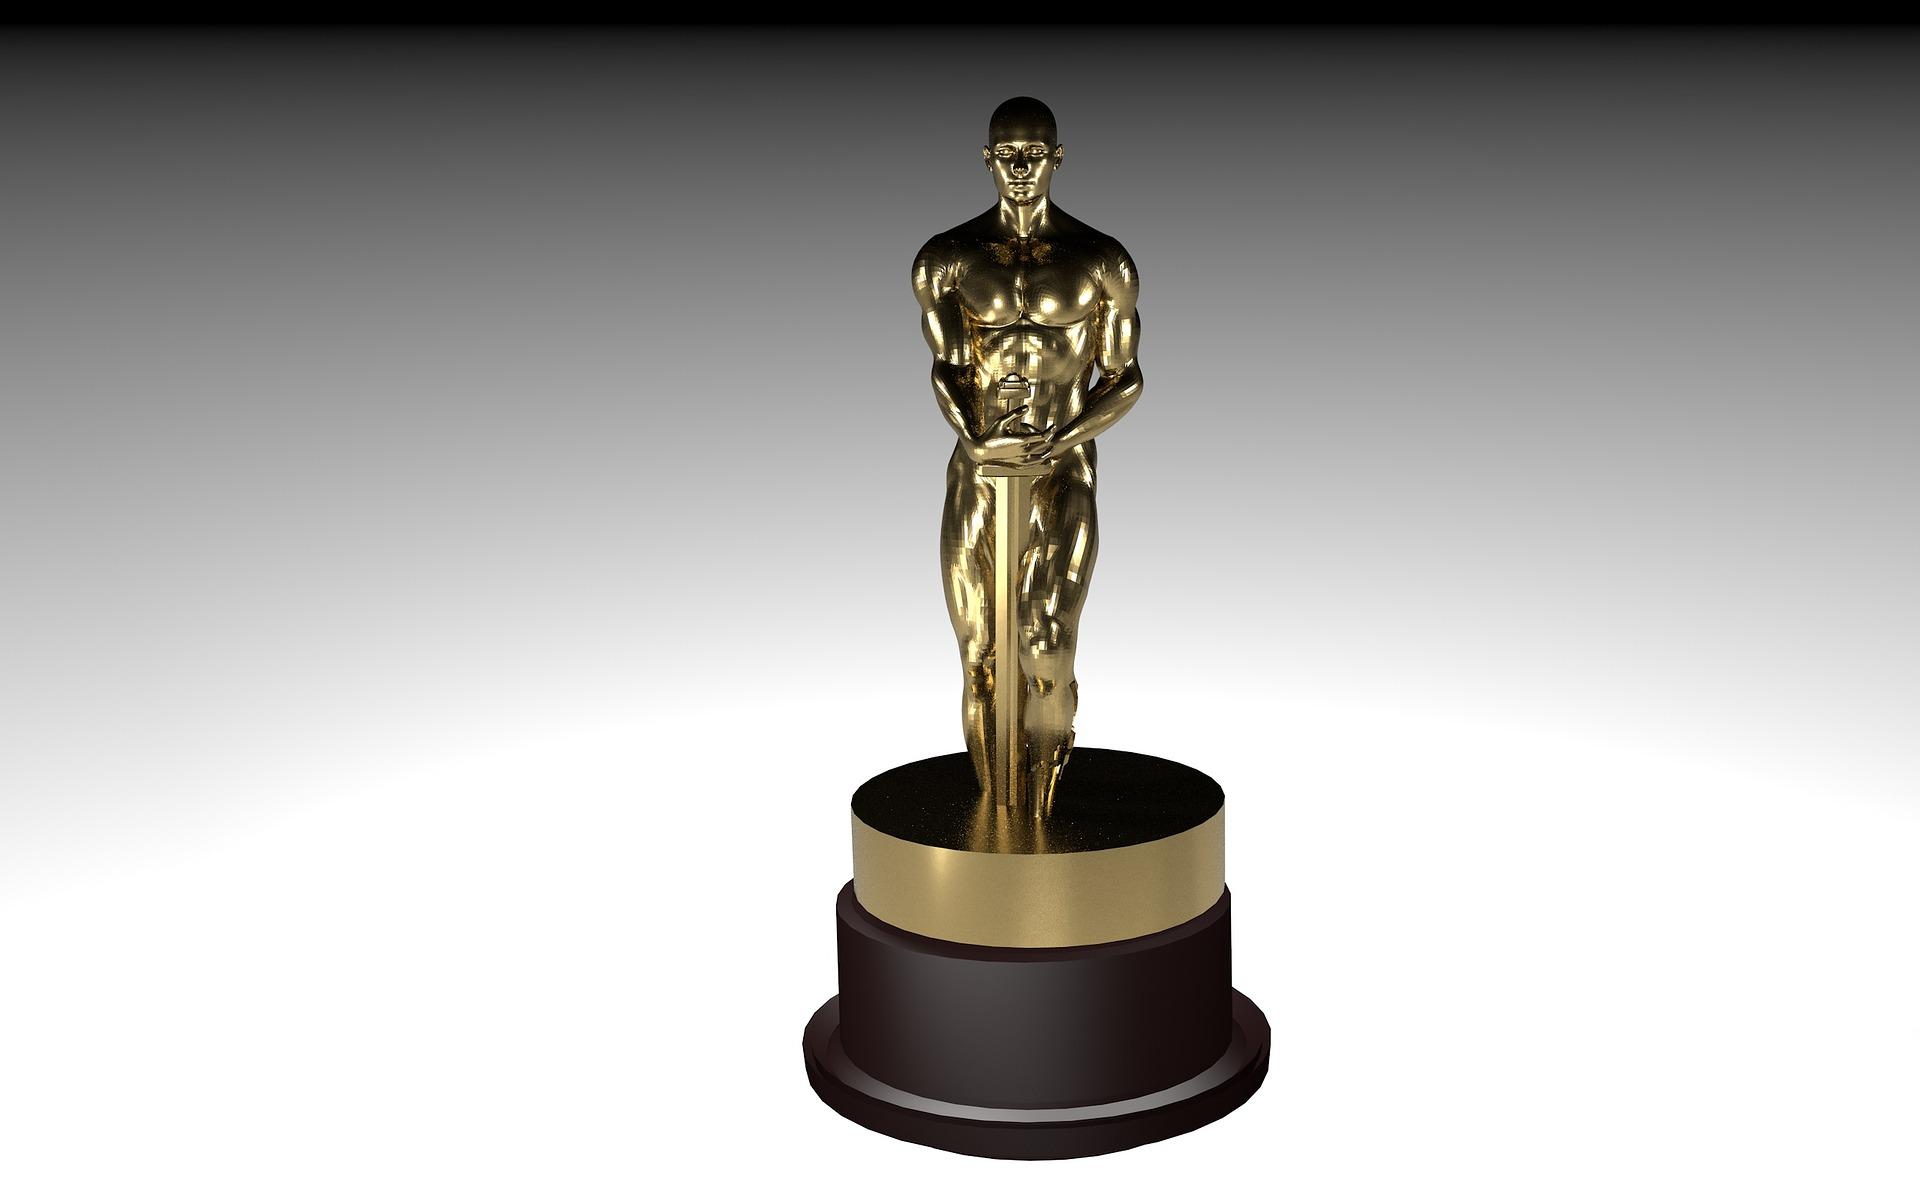 Oscar statuette - Oscars 2019